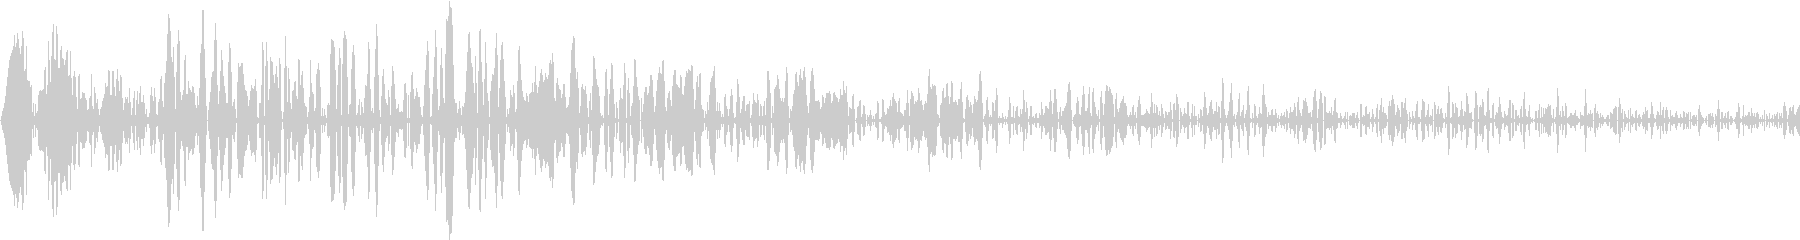 DTM Snare 8 オリジナル音源の未再生の波形